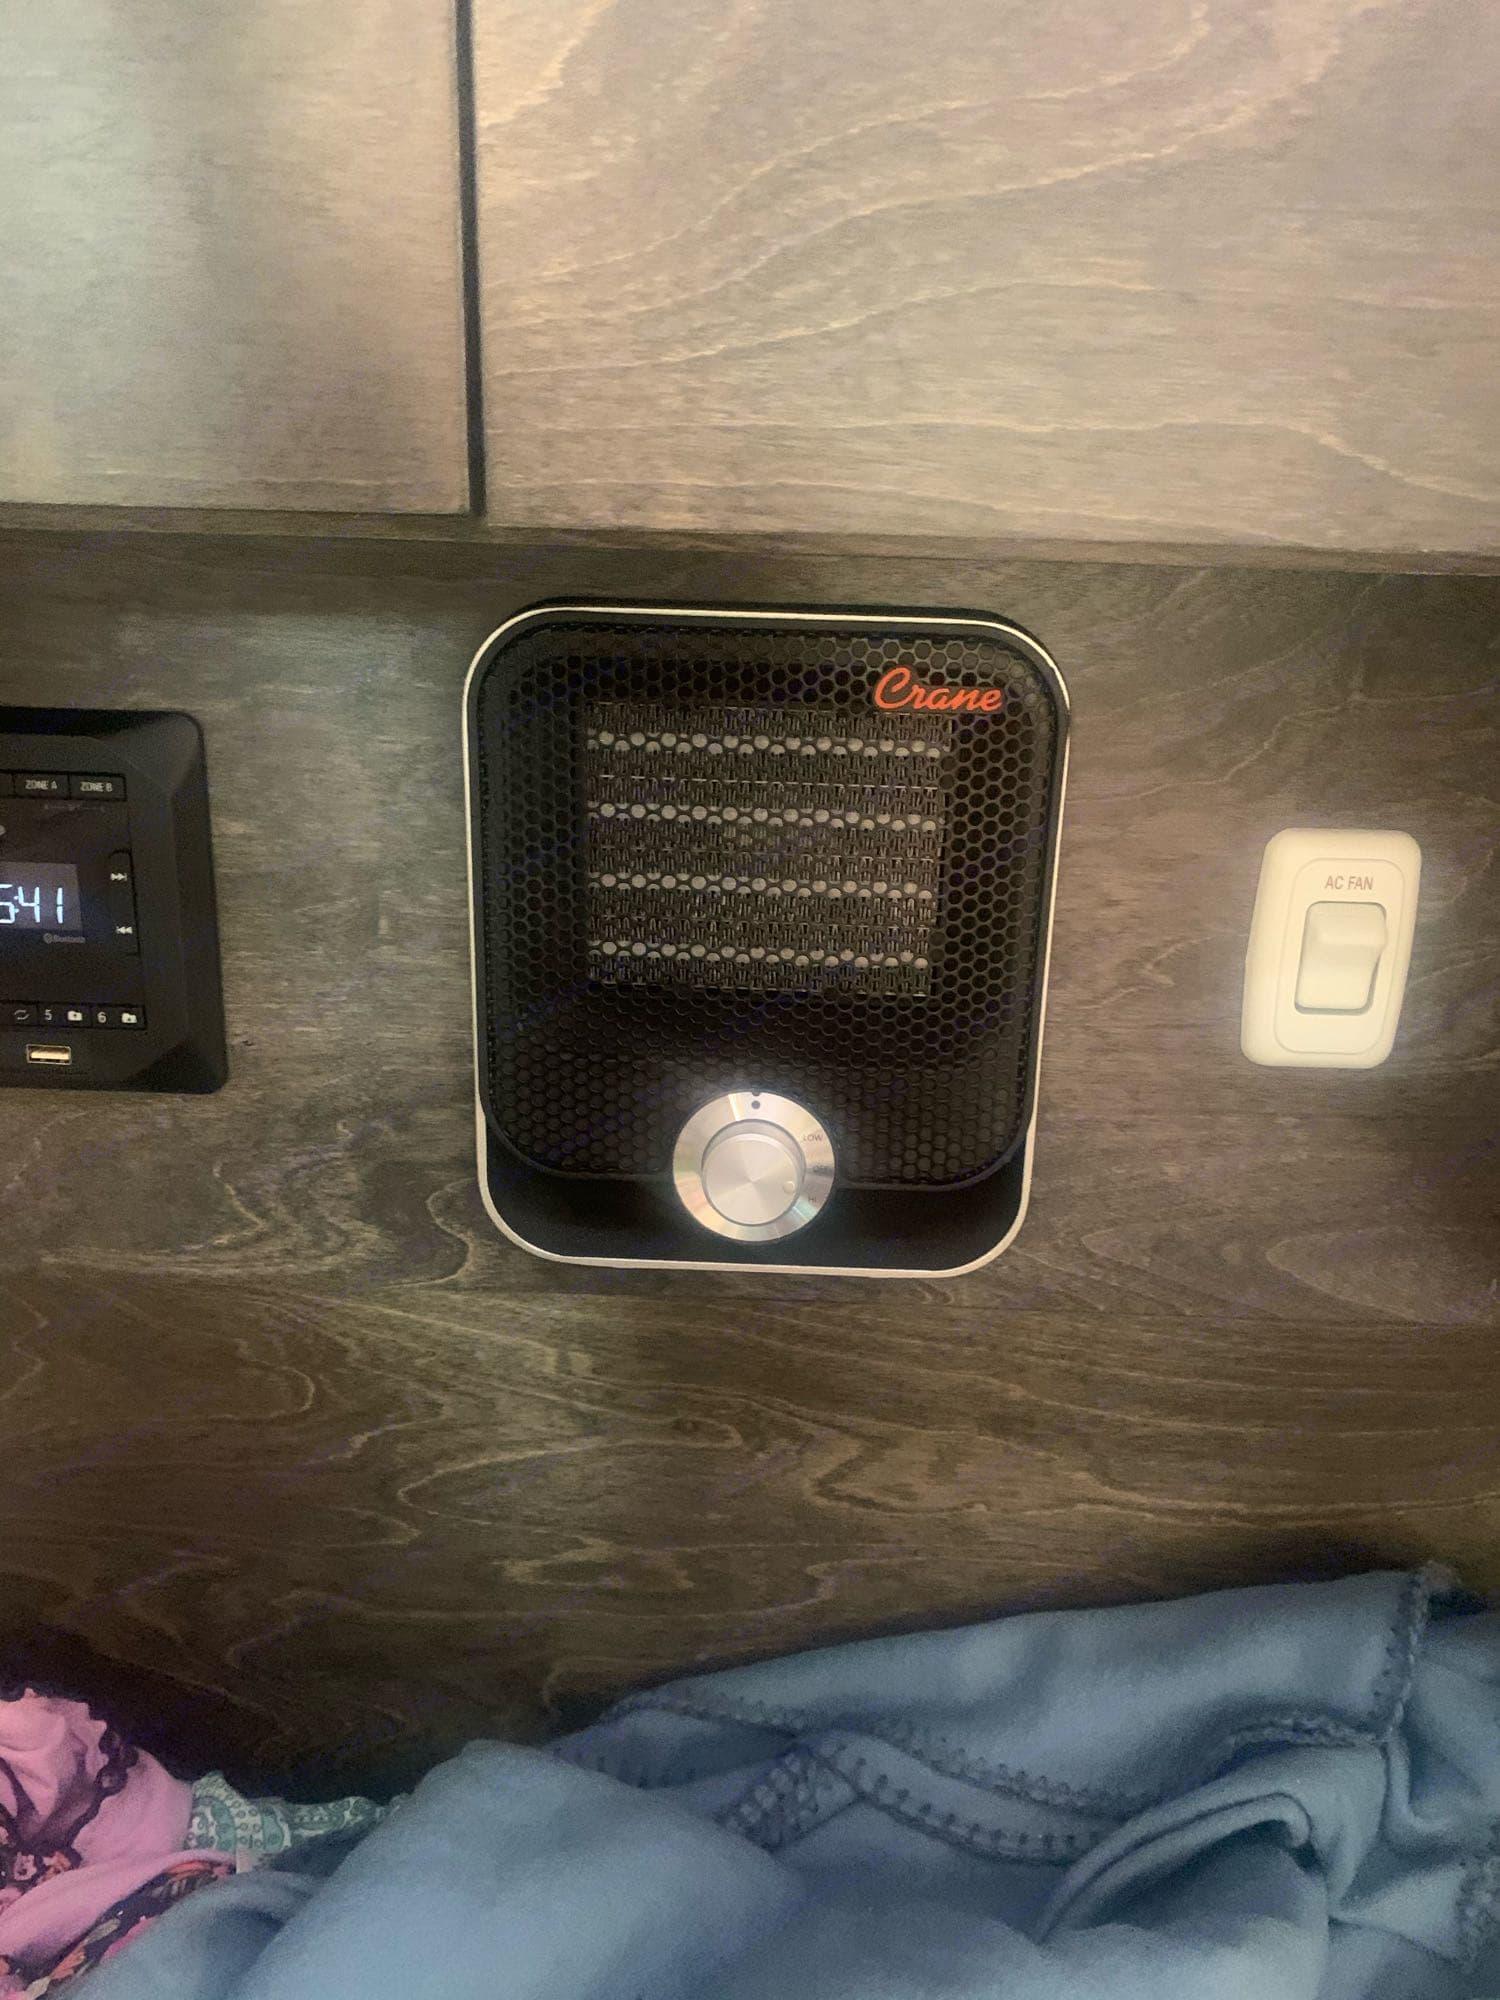 Remote control heat. NU Camp T@G Boondock 2021